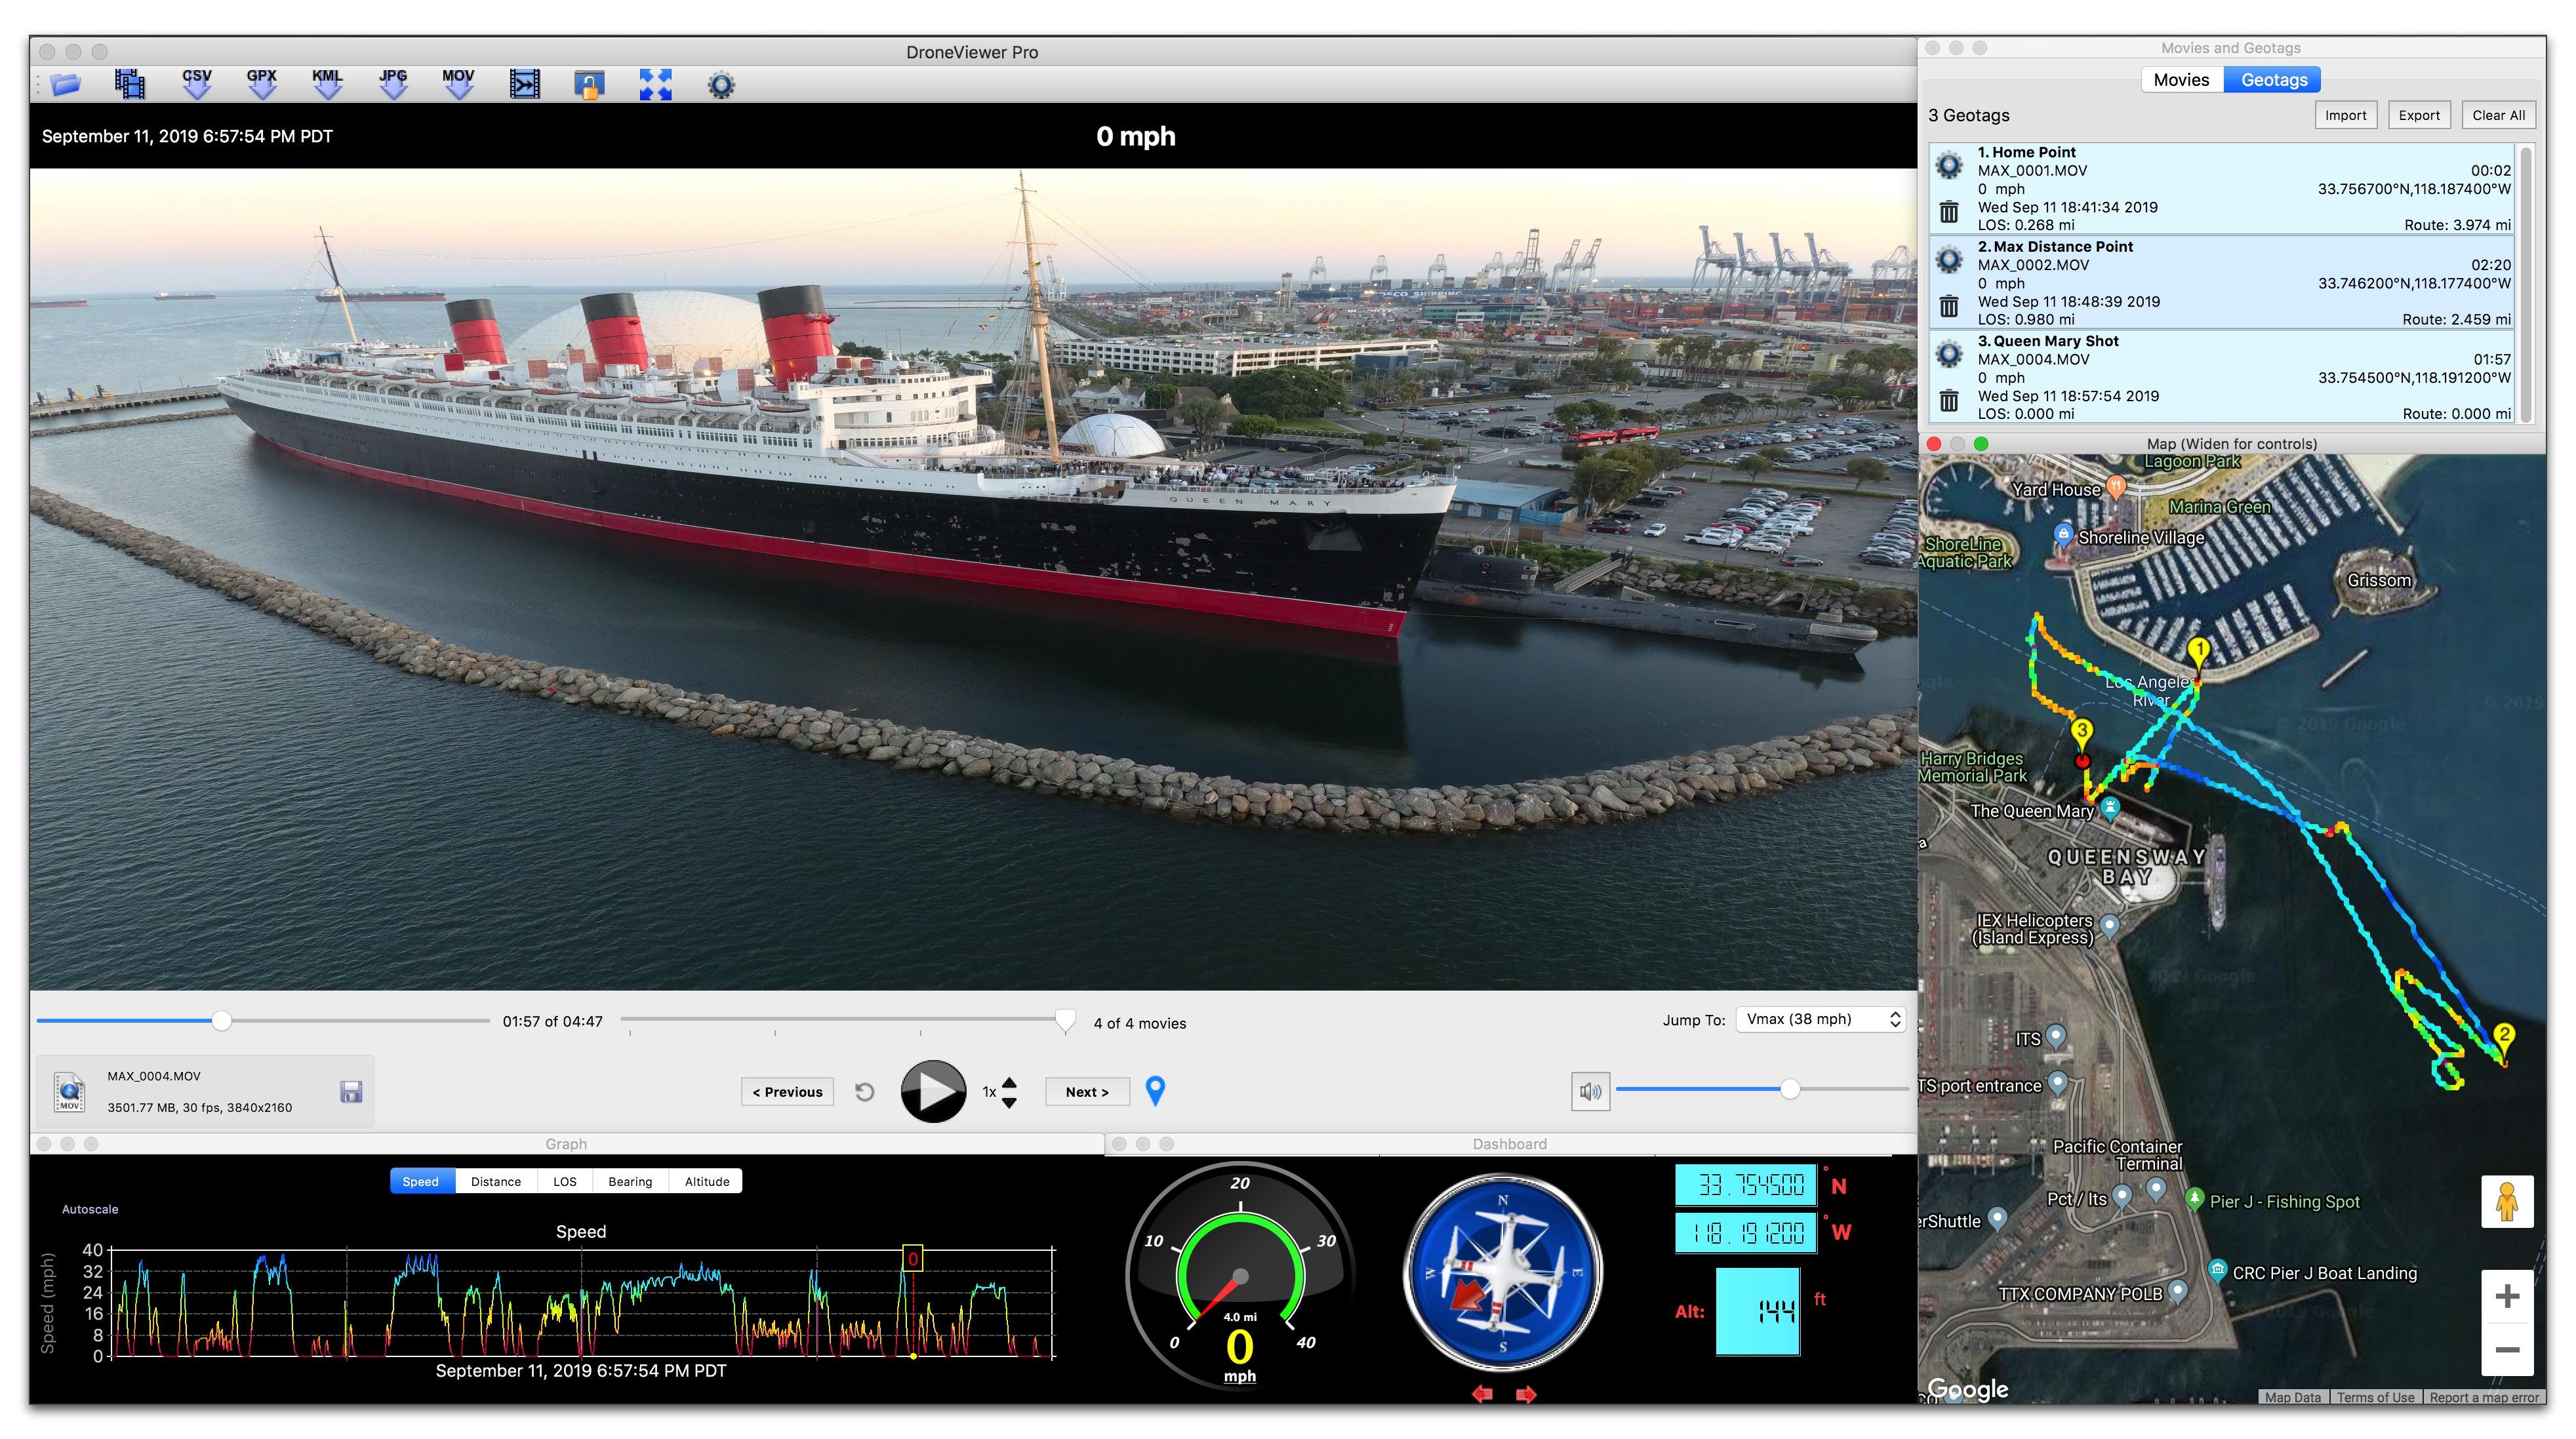 drone_viewer_v1.2.0